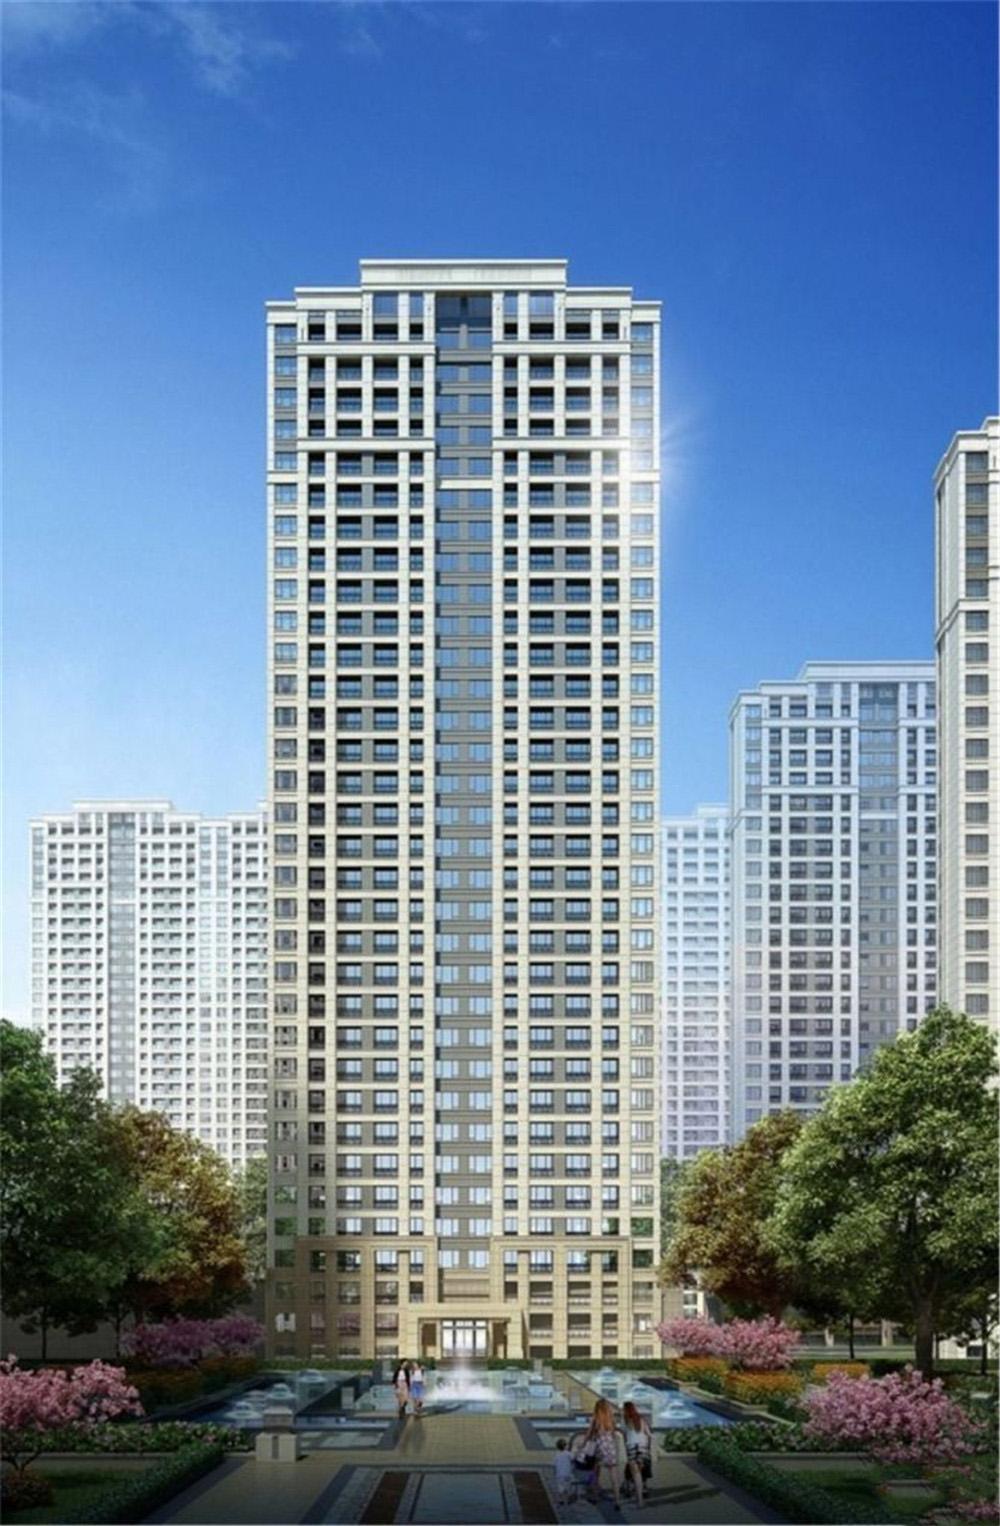 http://yuefangwangimg.oss-cn-hangzhou.aliyuncs.com/uploads/20191127/d4a2c9cc0a1fb16c33ba9409630c62c1Max.jpg